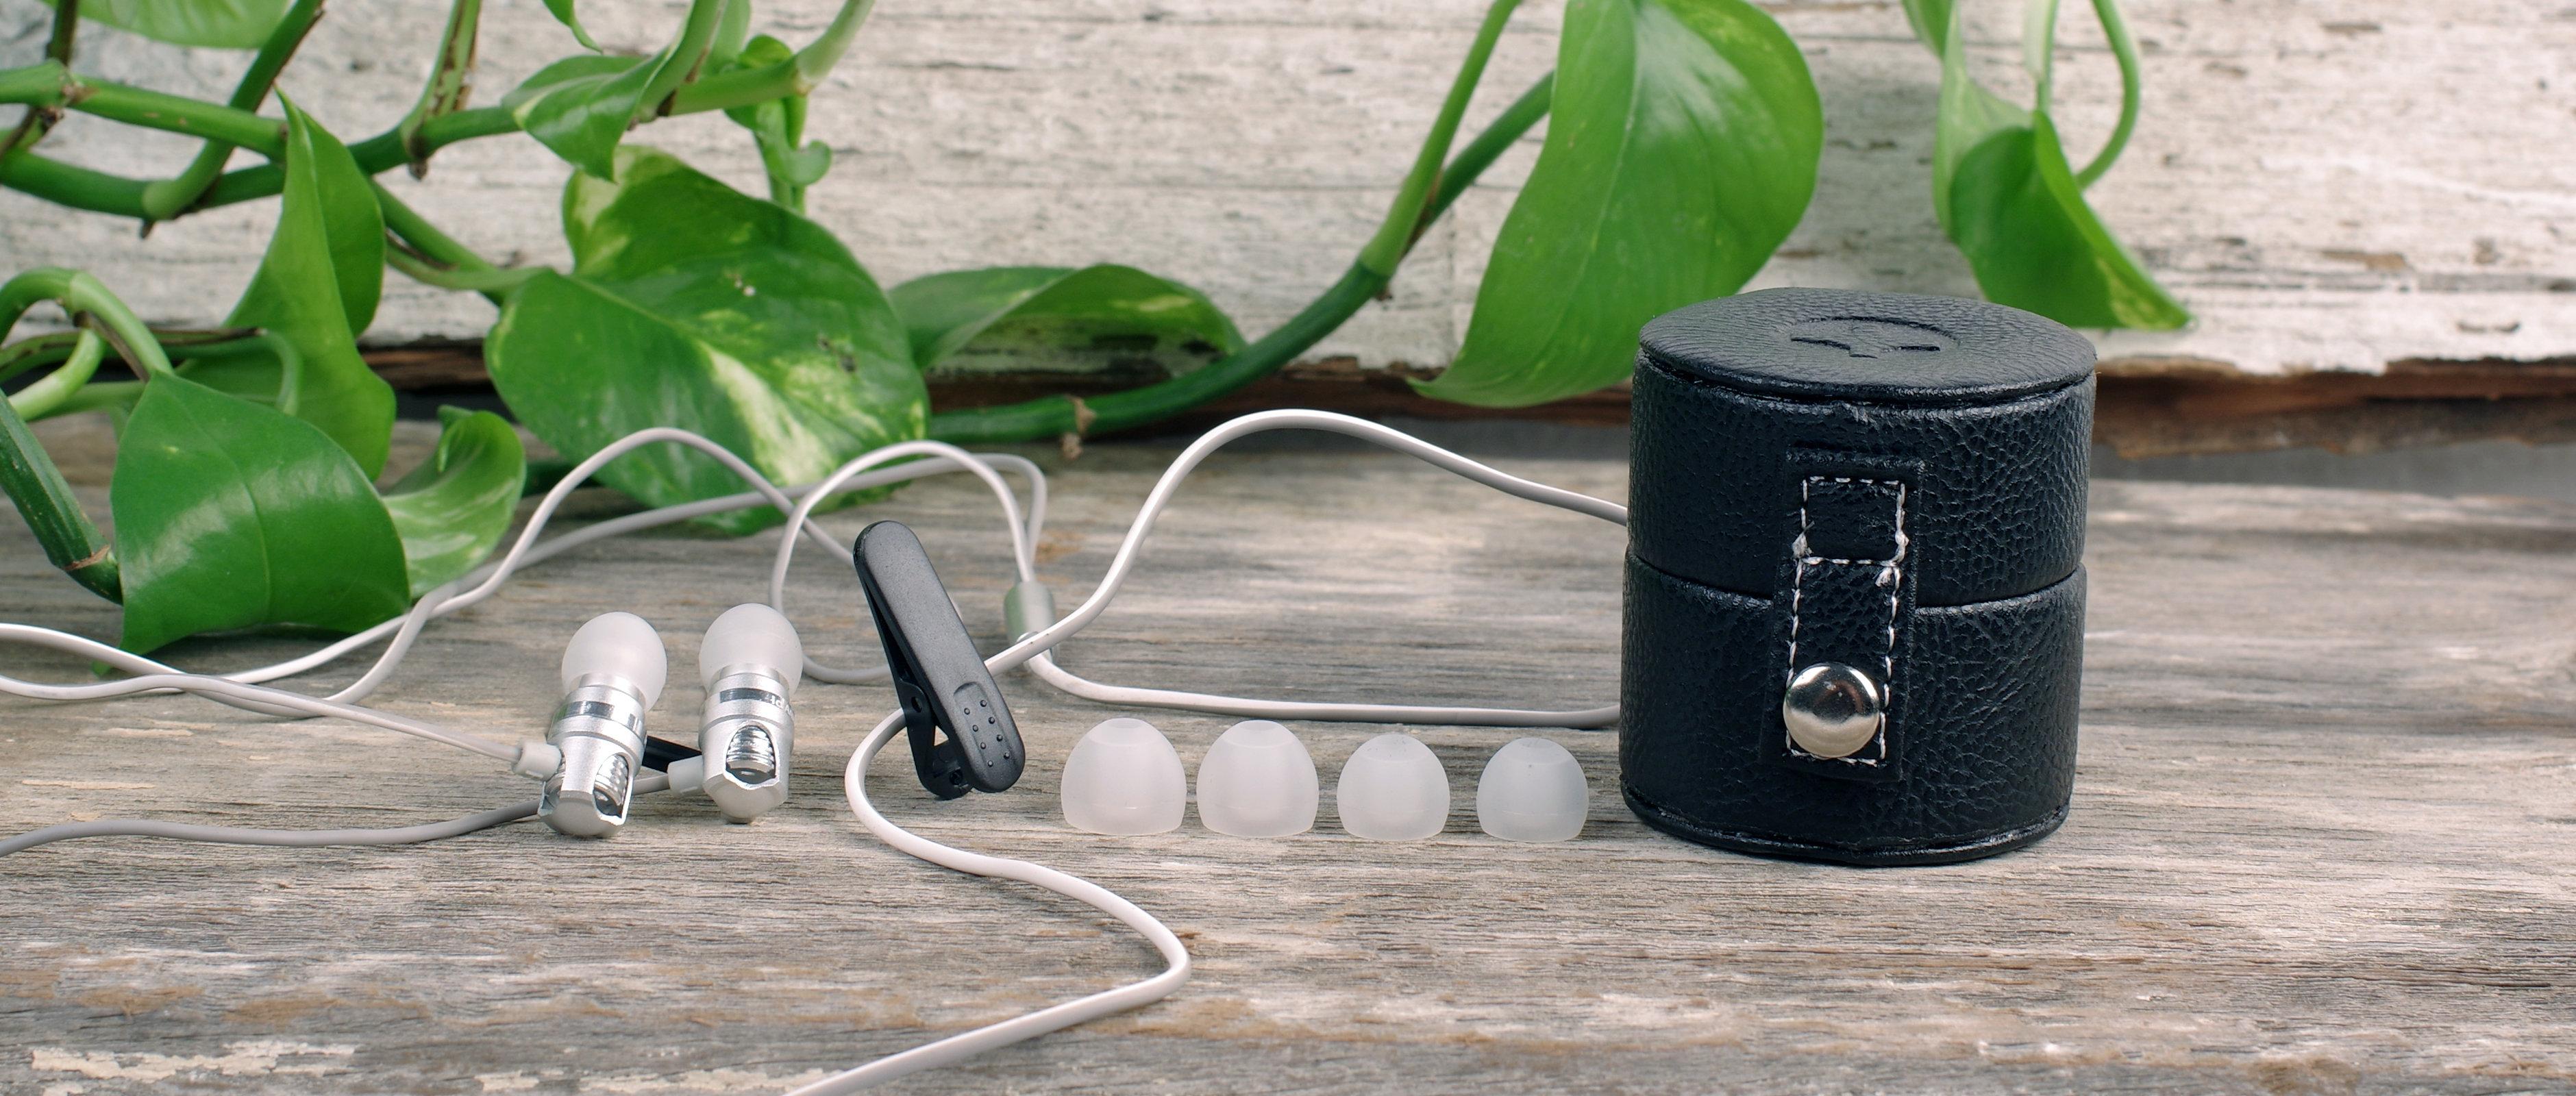 The id America Spark IDH 102 in-ear headphones